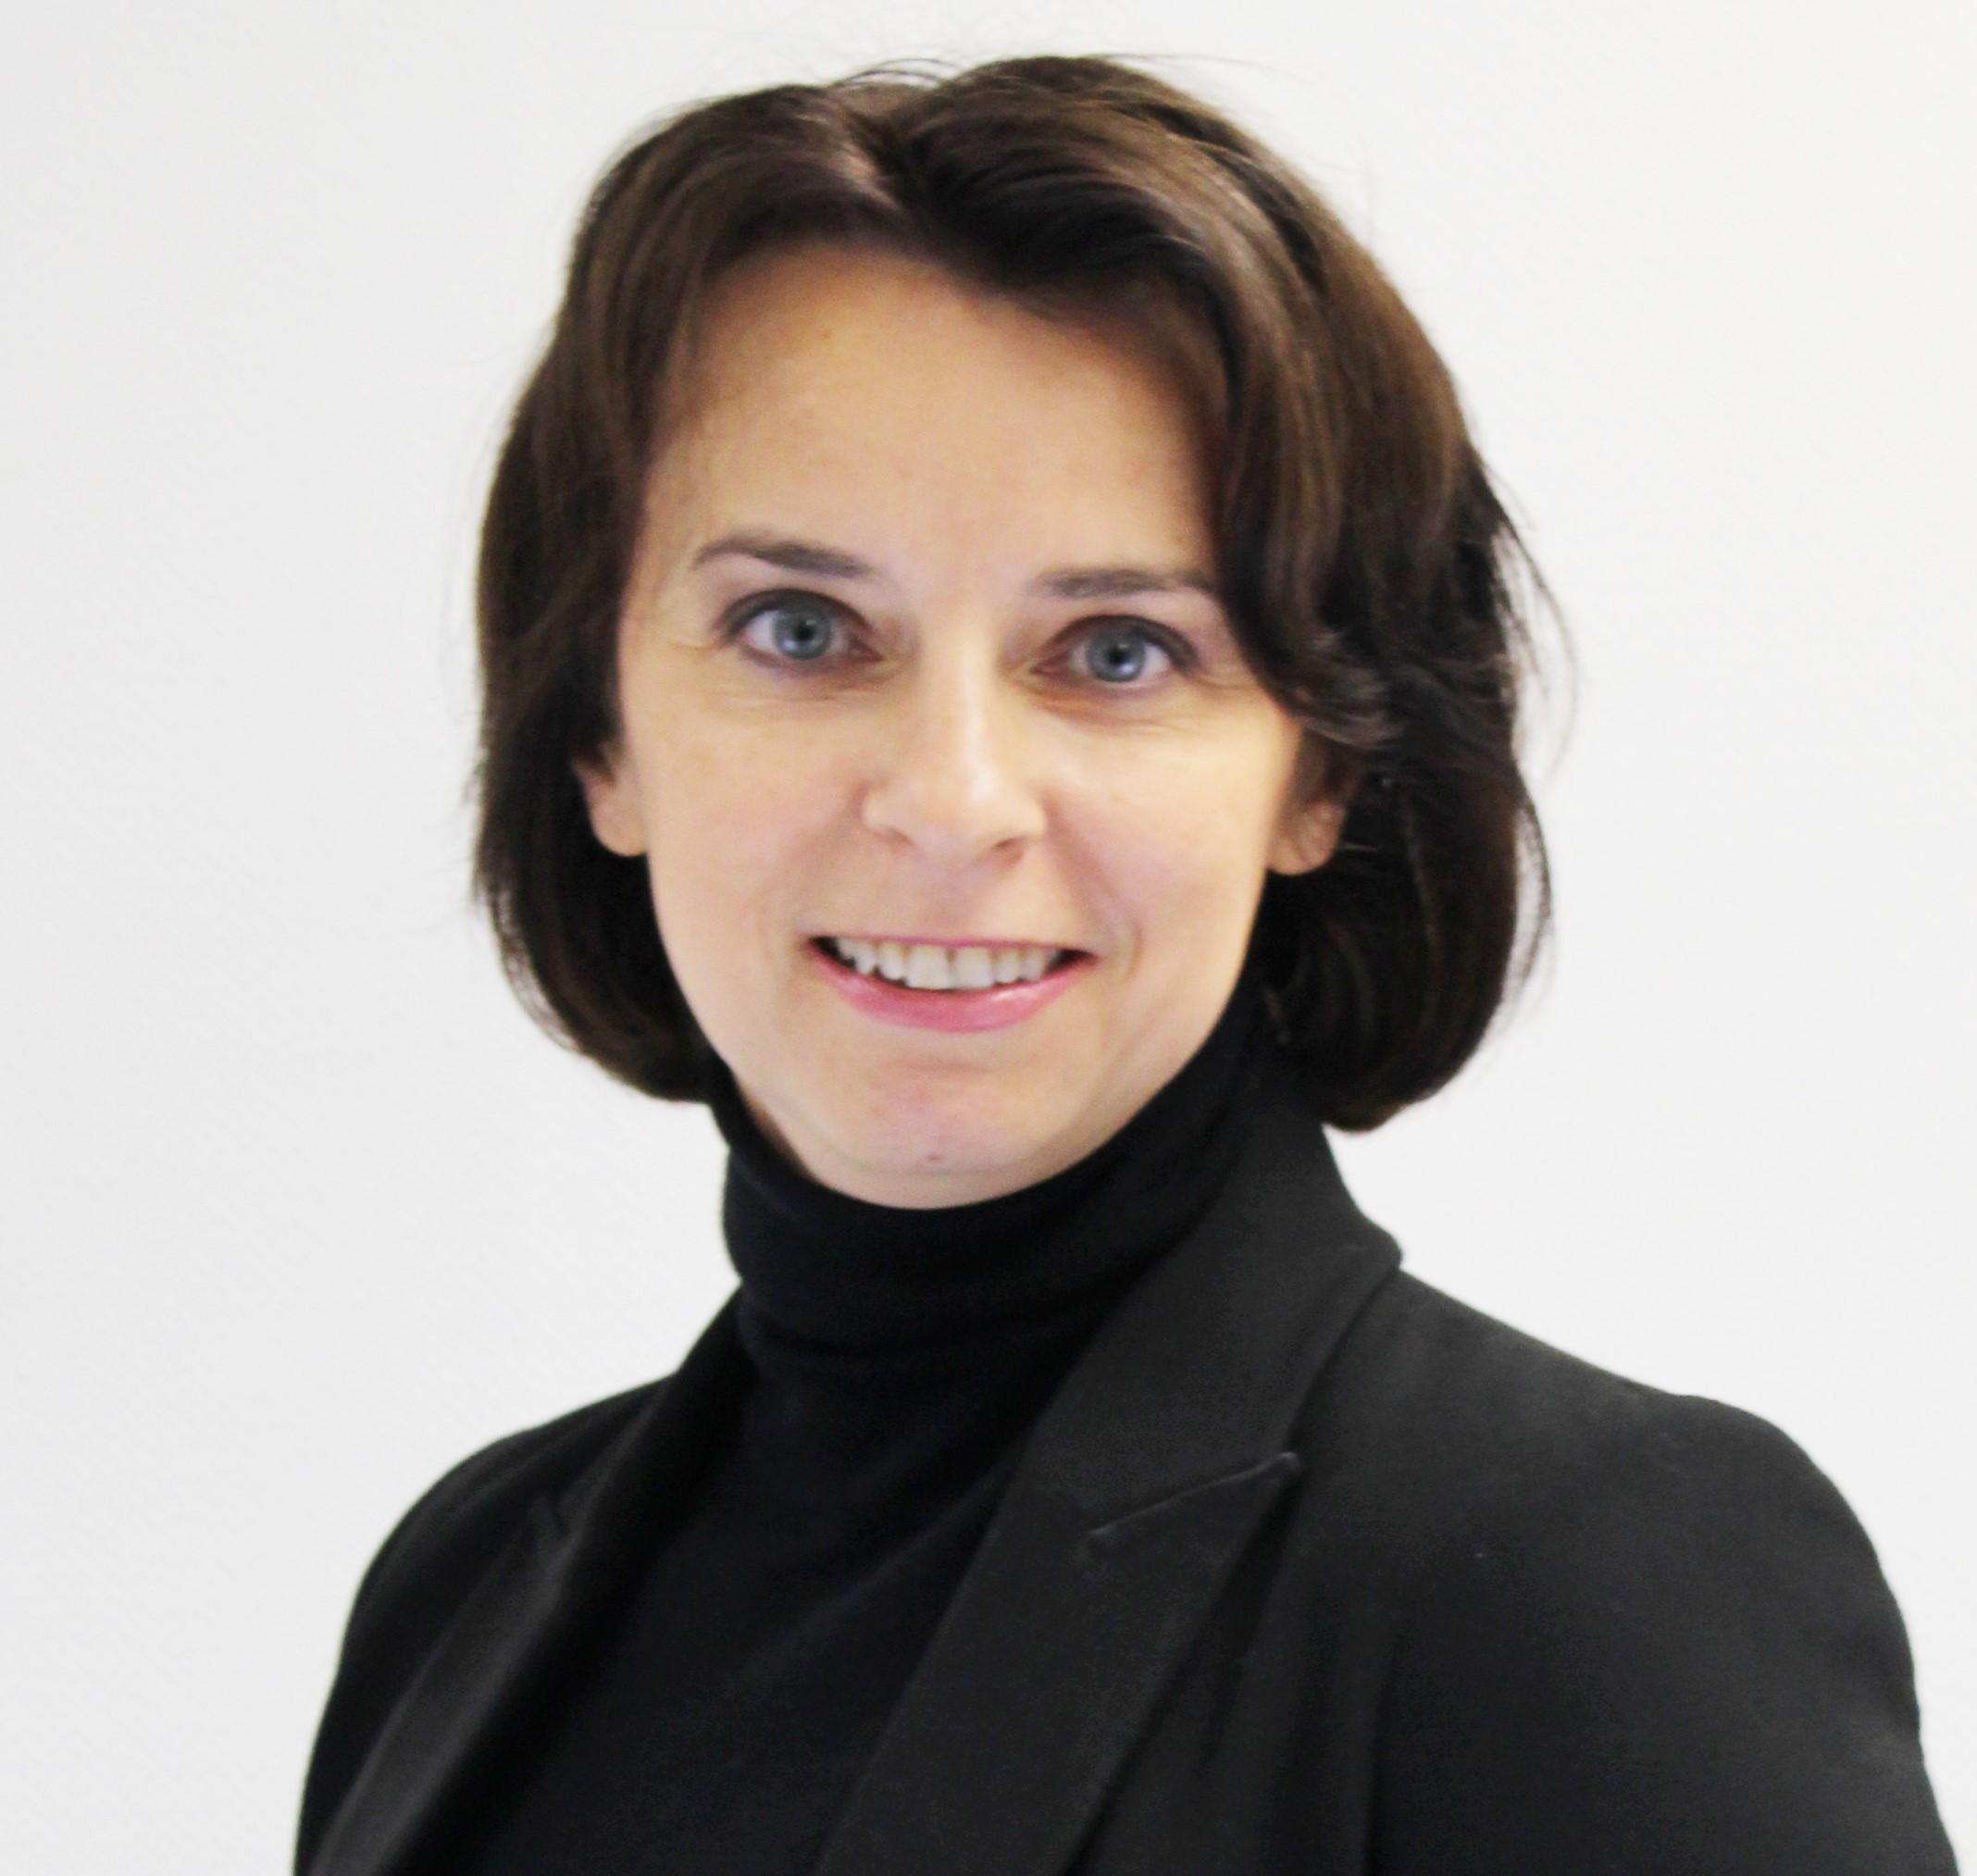 cv web de oxana yankevich  assistante